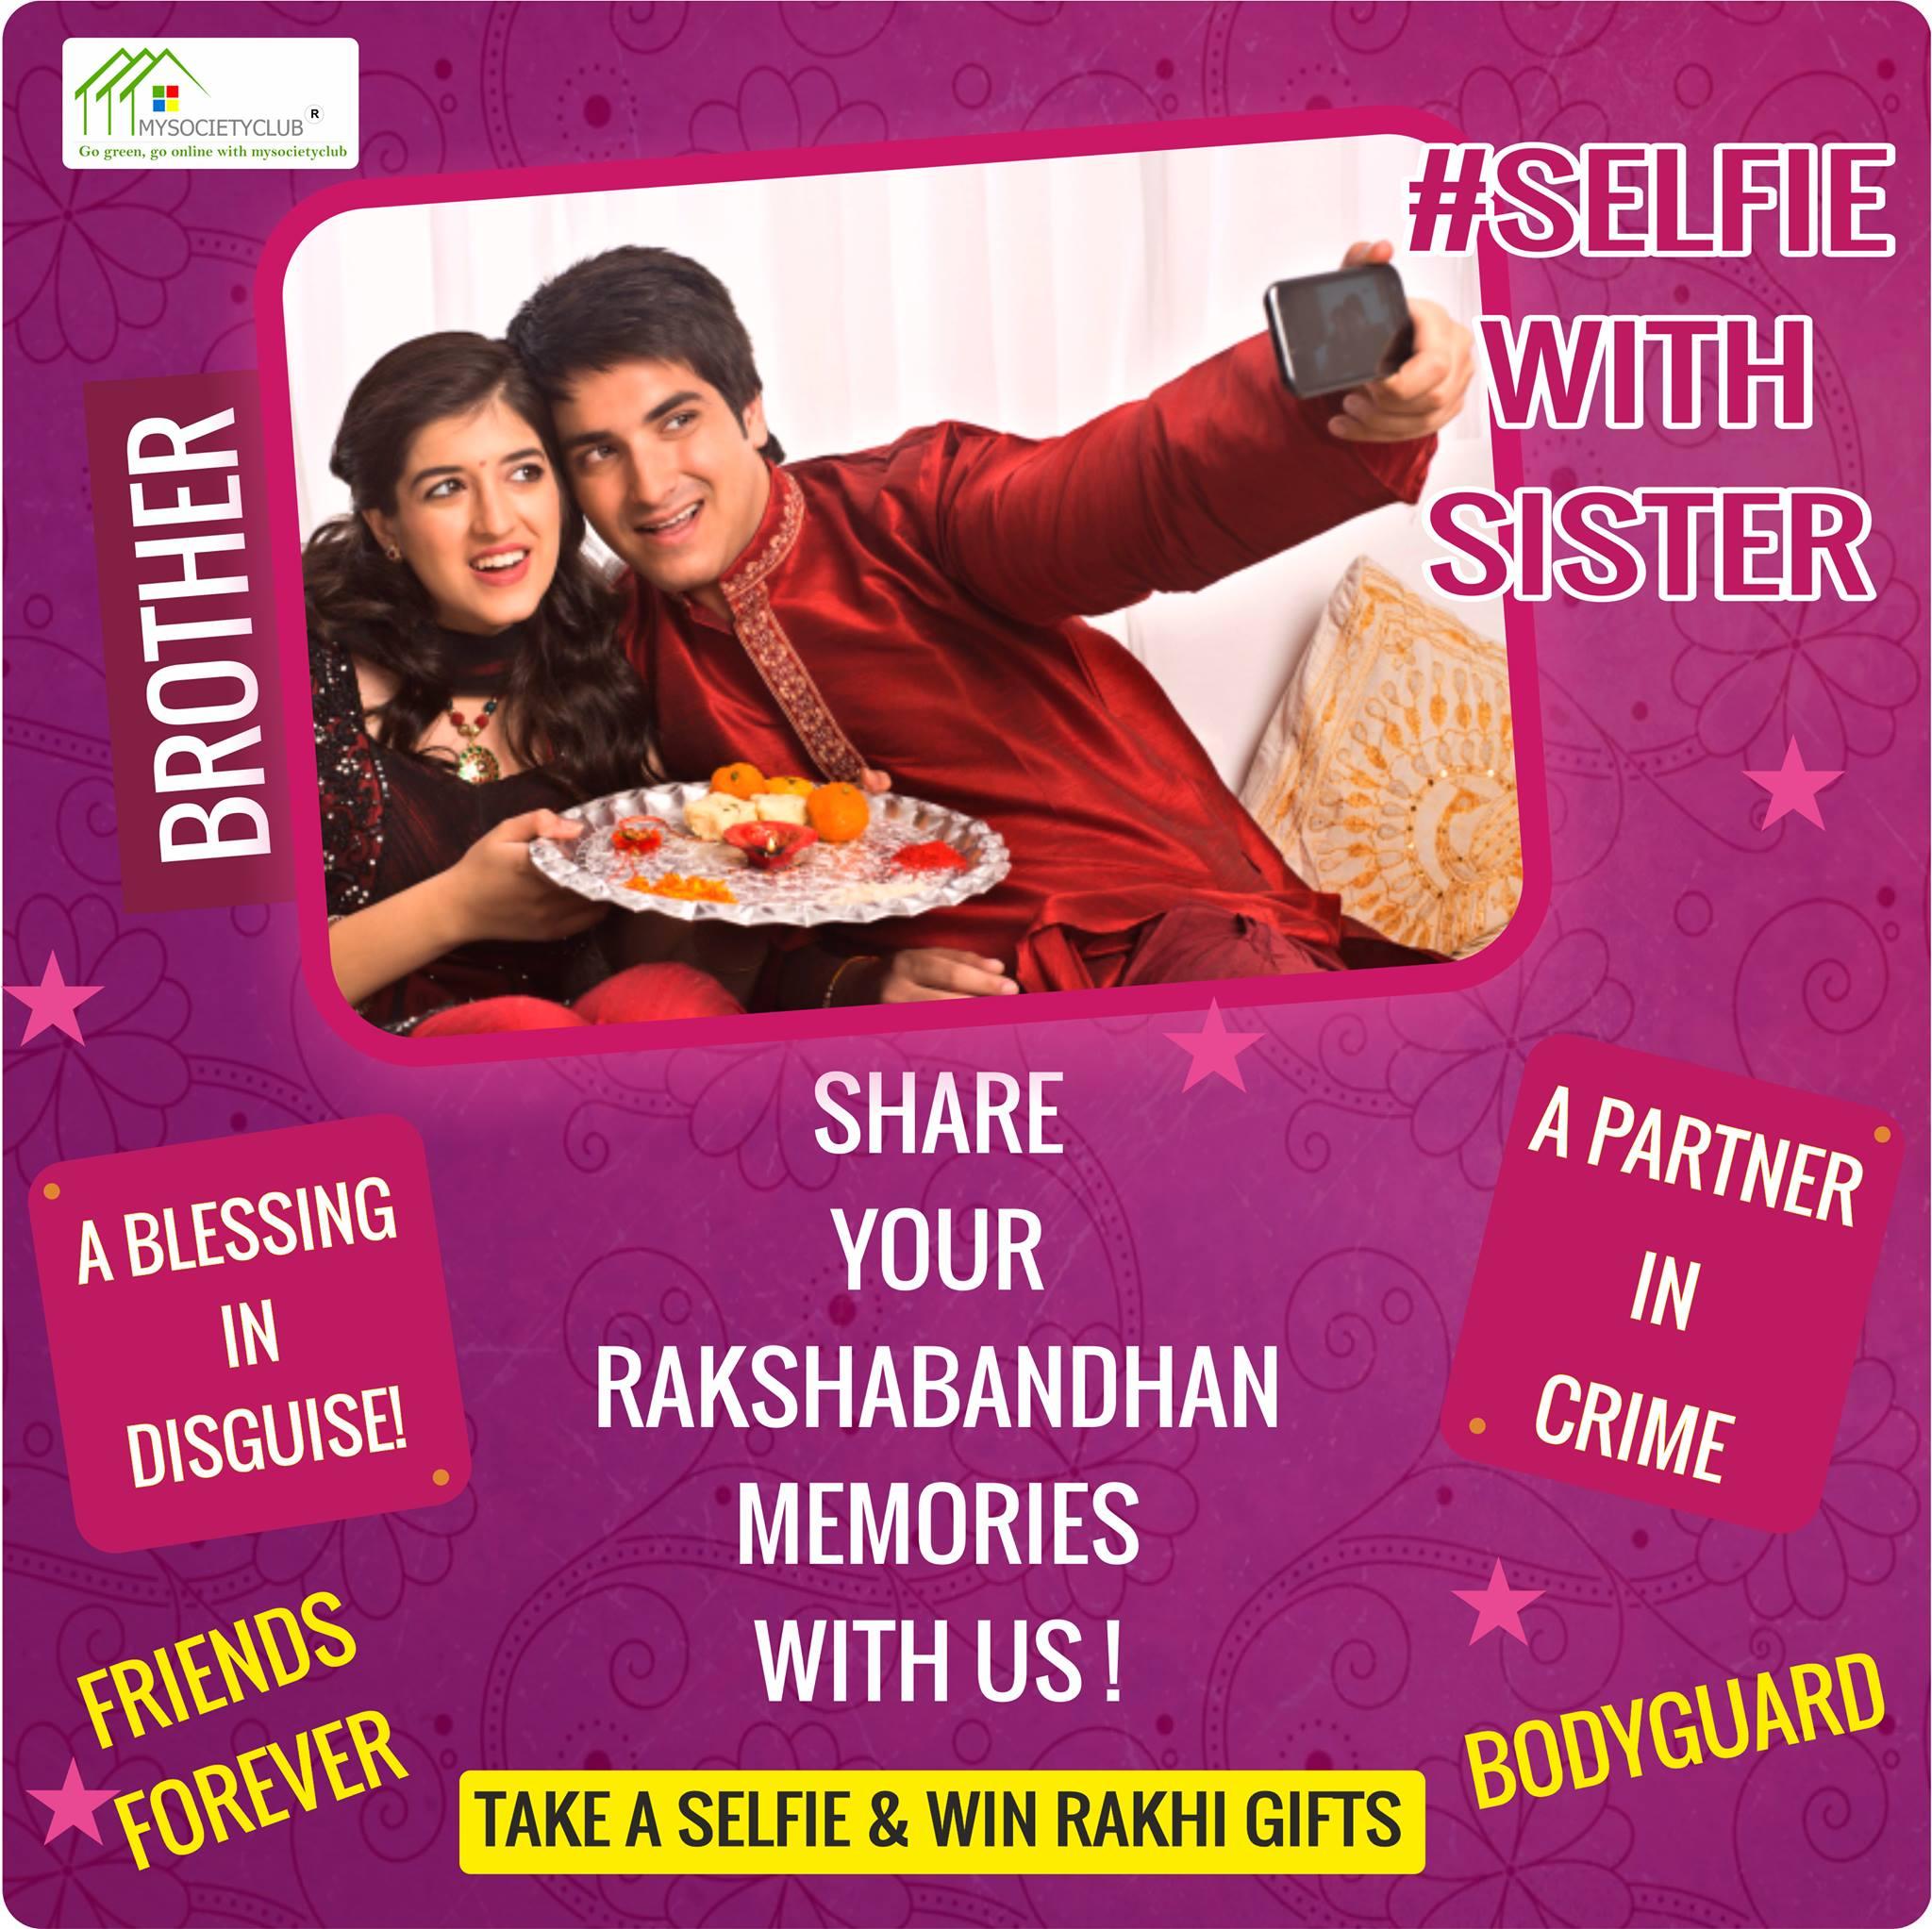 MySocietyClub Raksha Bandhan Selfie with Sister Contest 2017